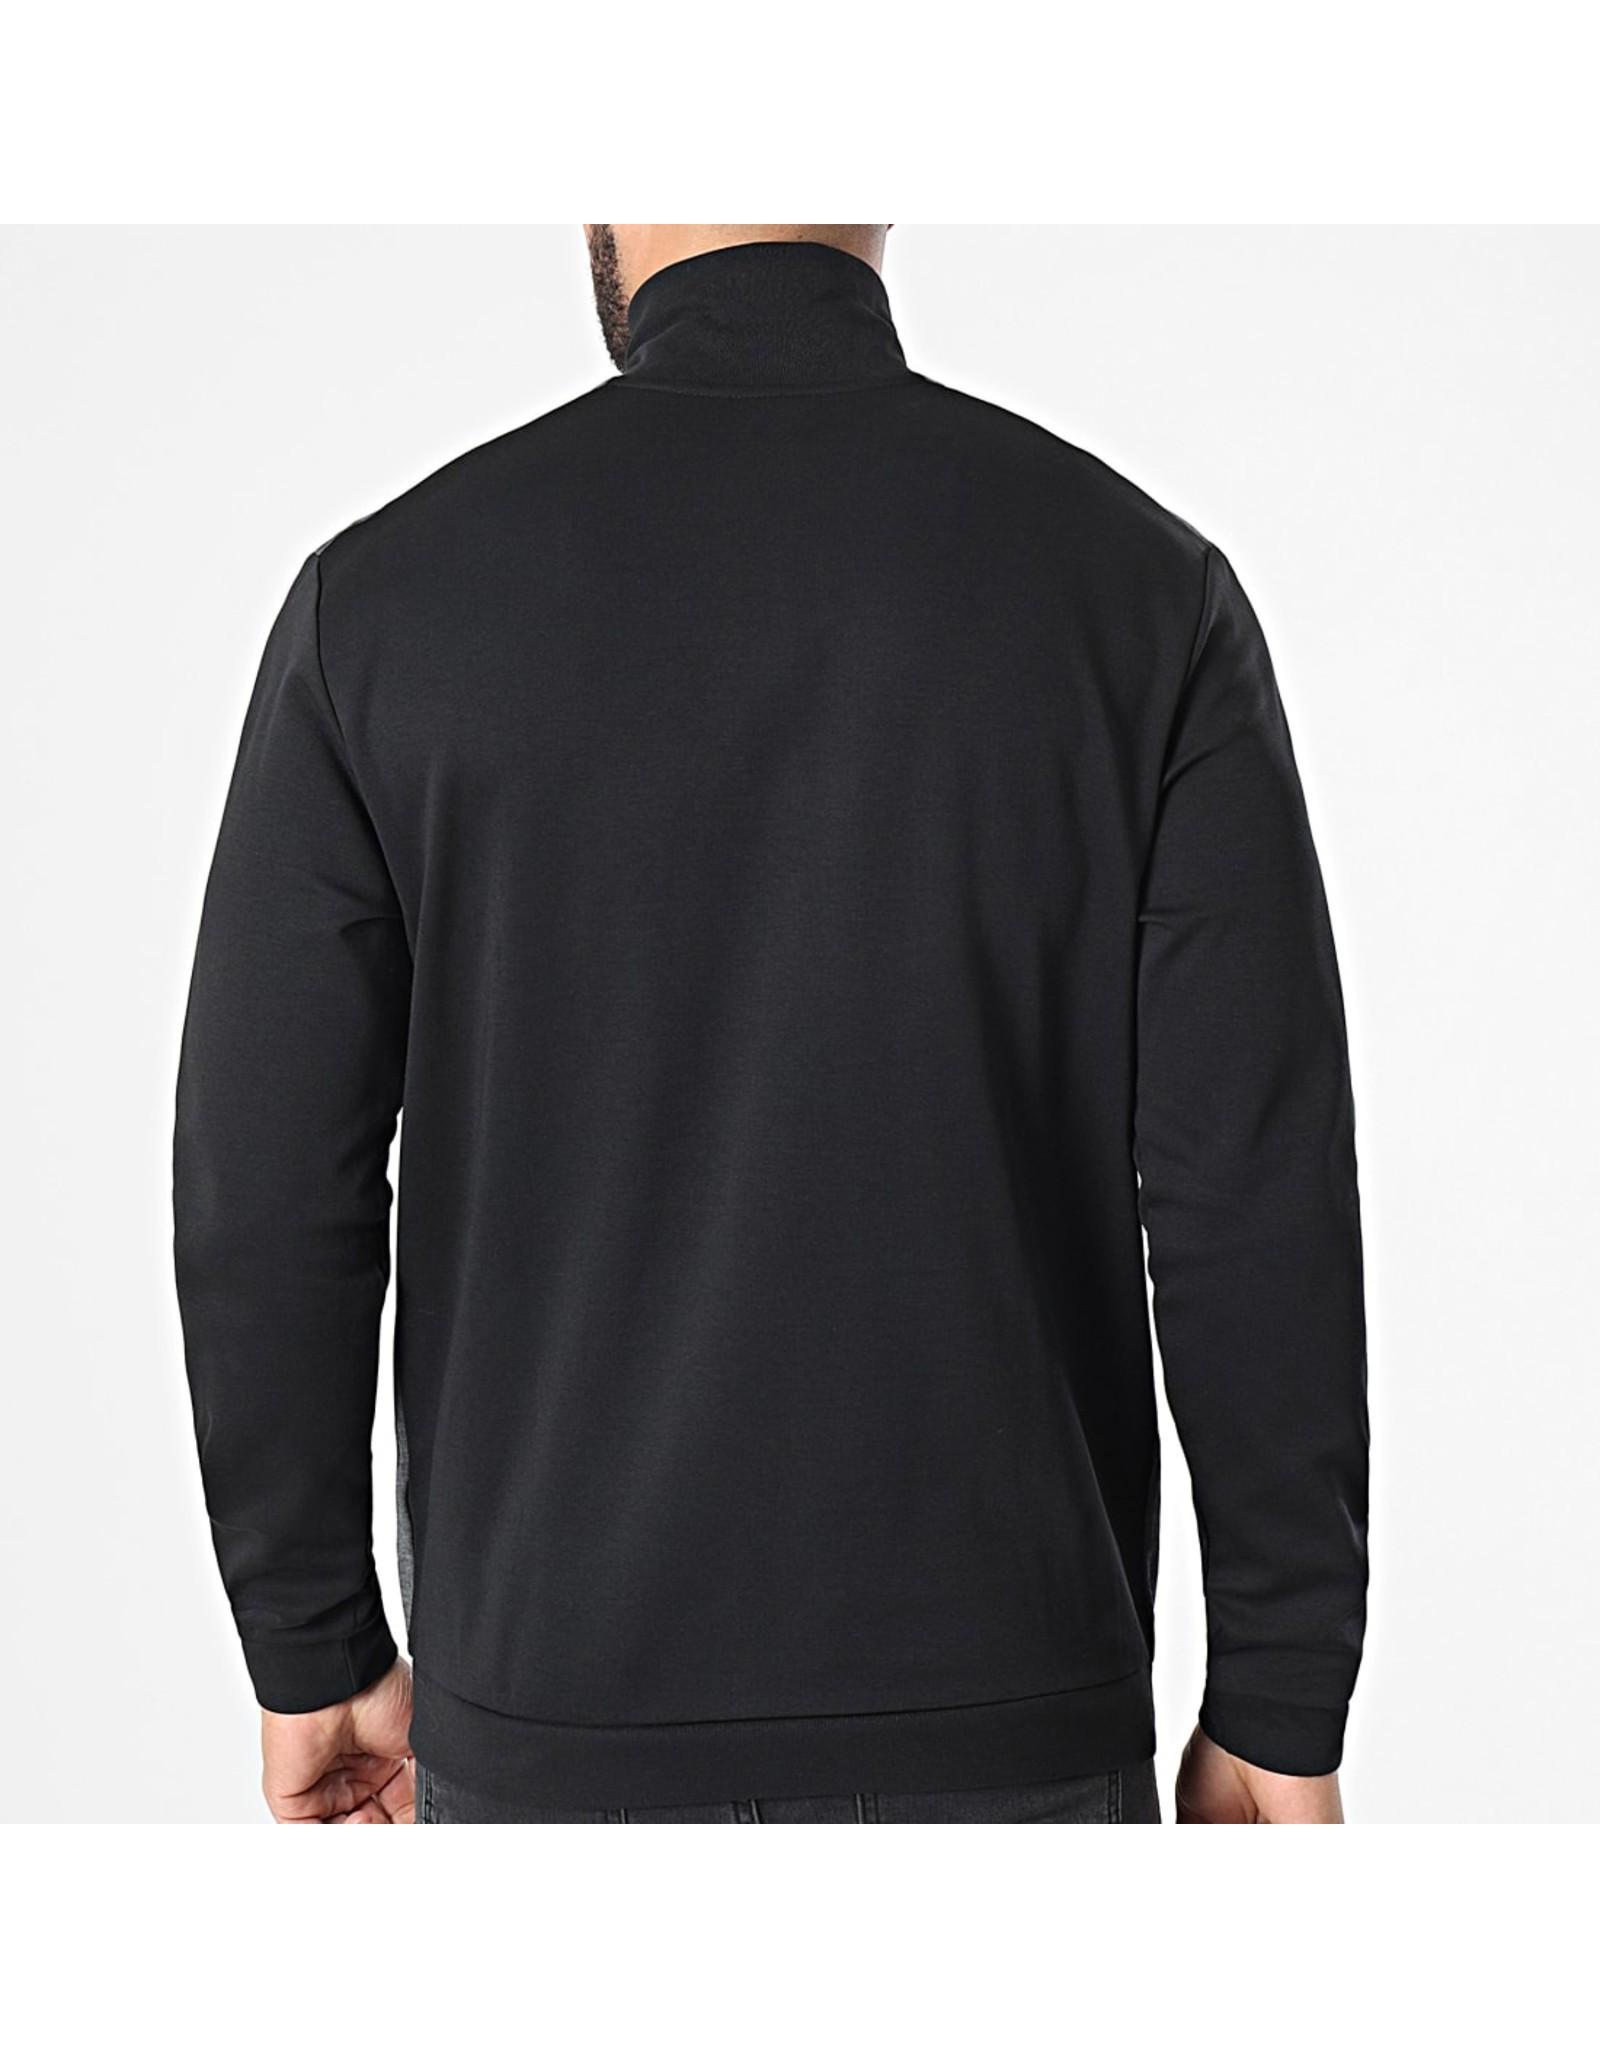 BOSS LOUNGEWEAR BOSS LOUNGE Tracksuit sweater